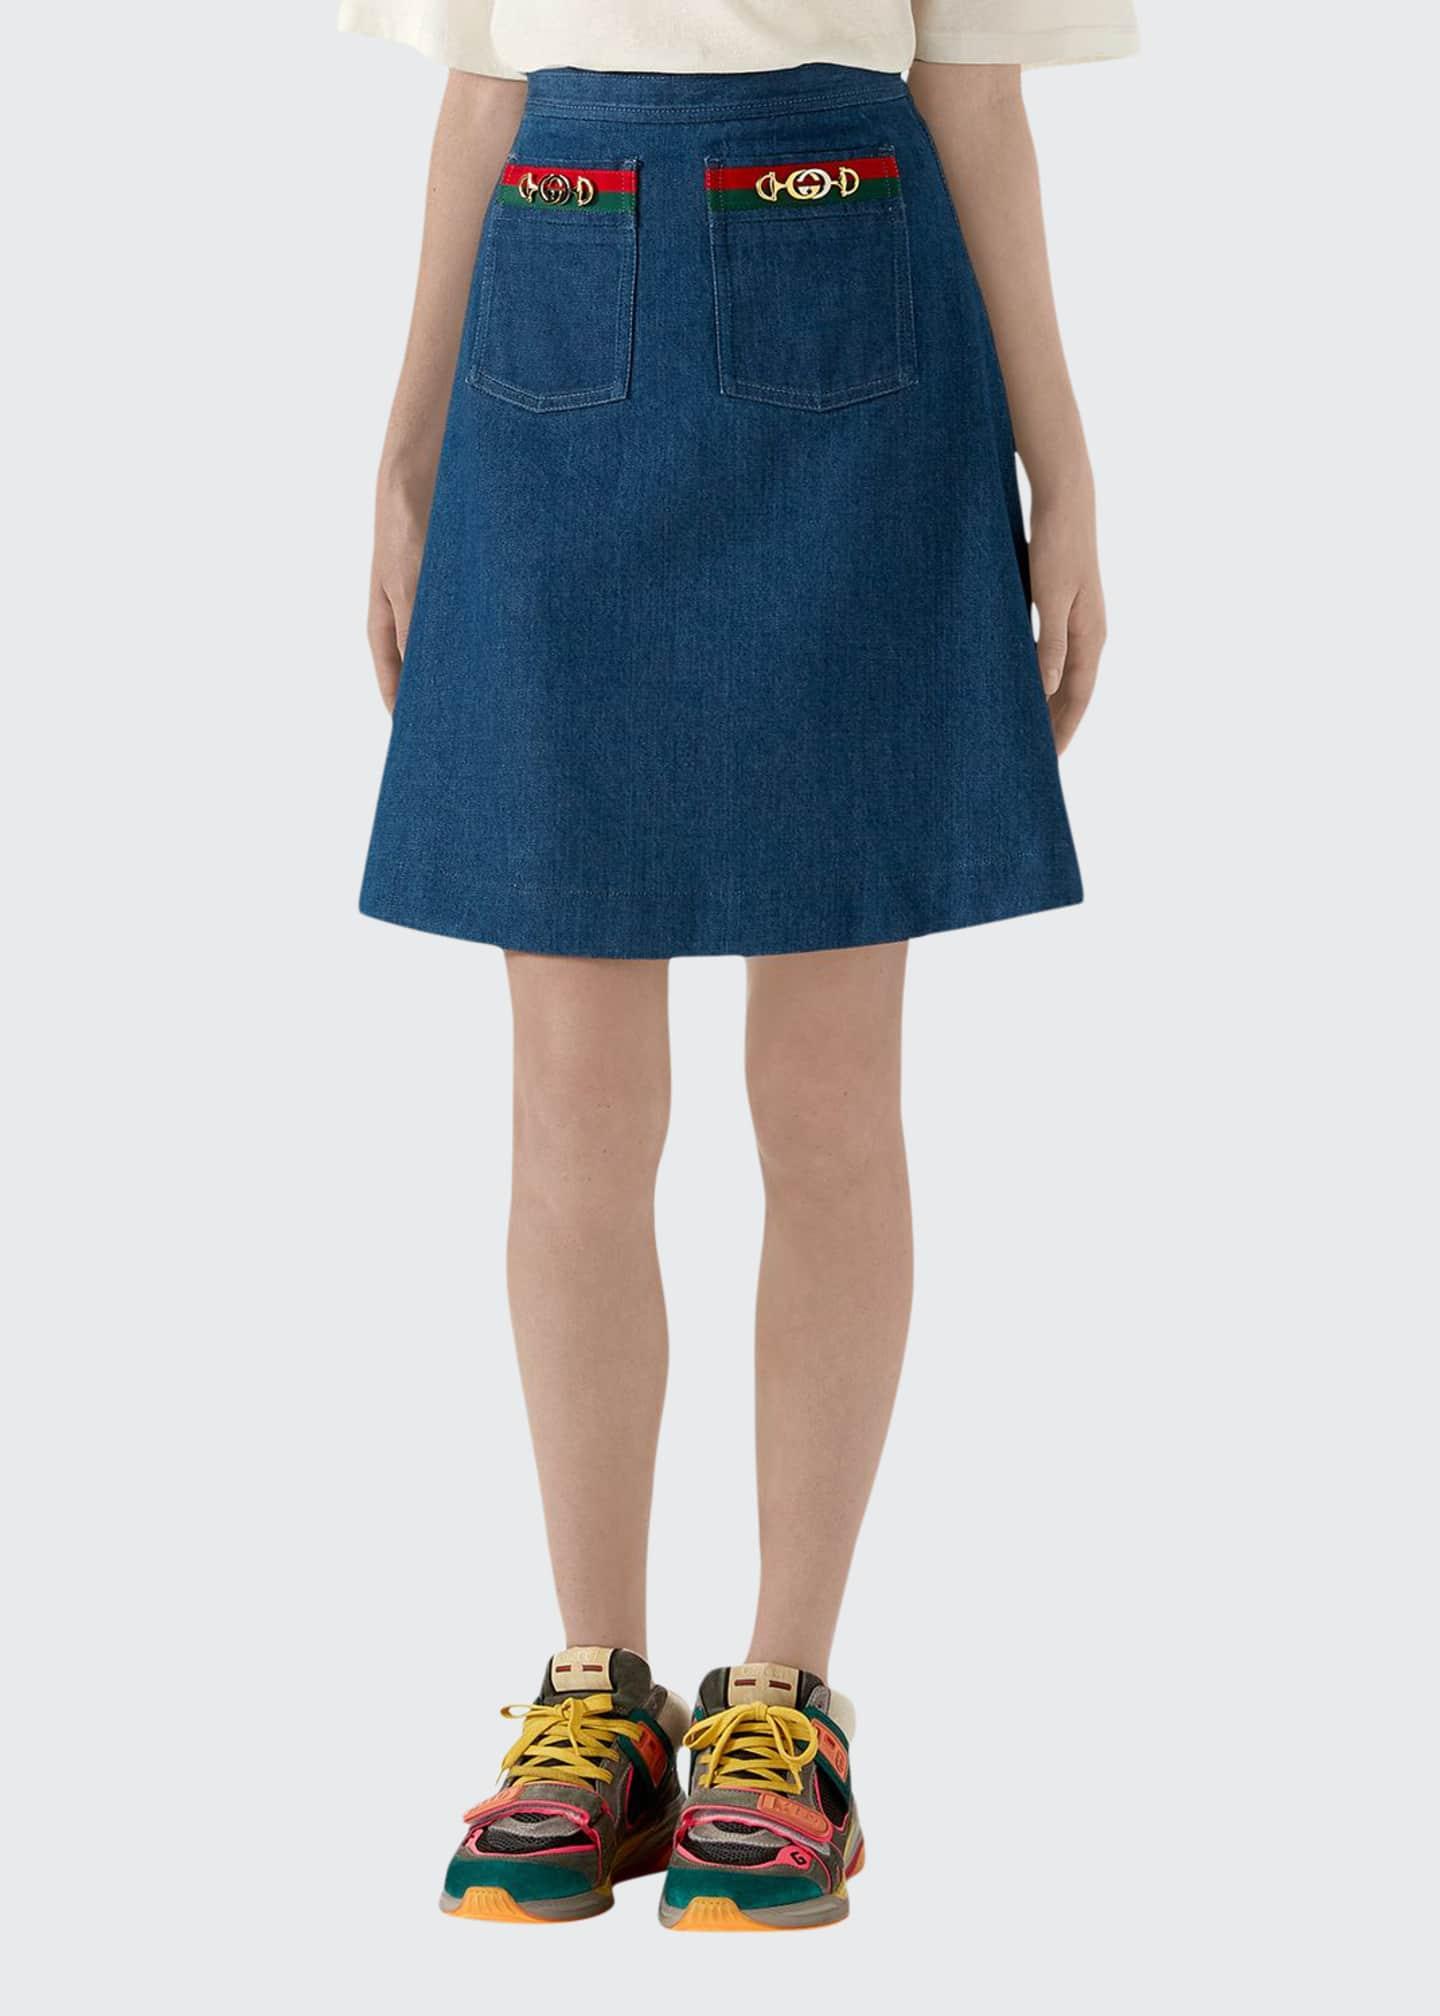 Gucci Dark Denim A-Line Skirt With Web Details